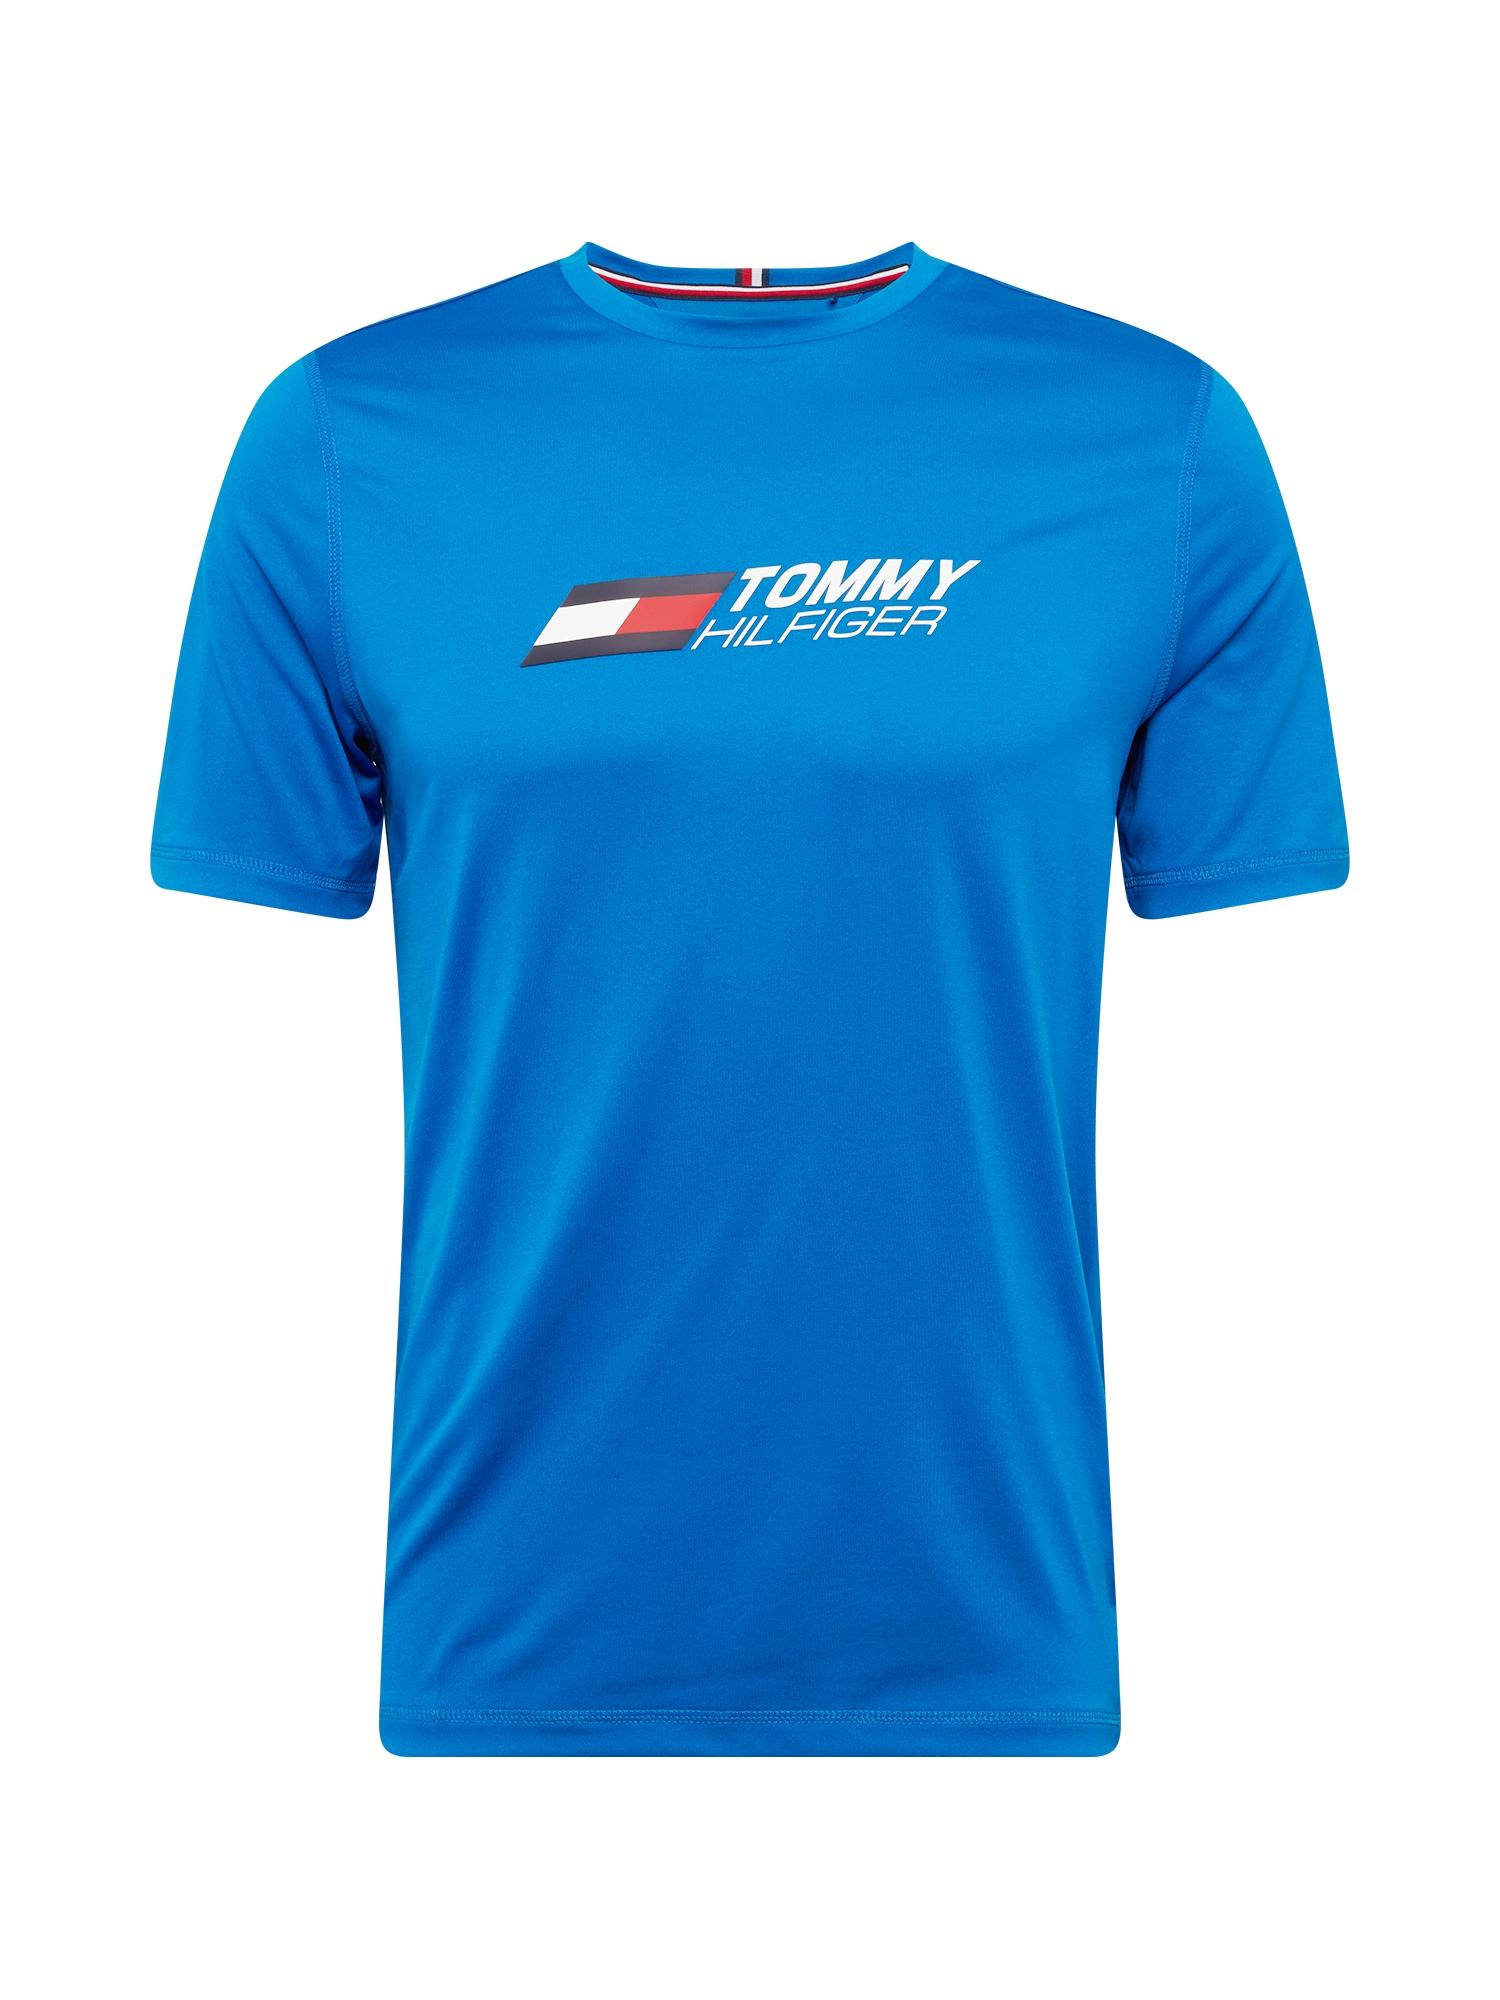 Tommy Sport Sportiniai marškinėliai mėlyna / balta / nakties mėlyna / raudona